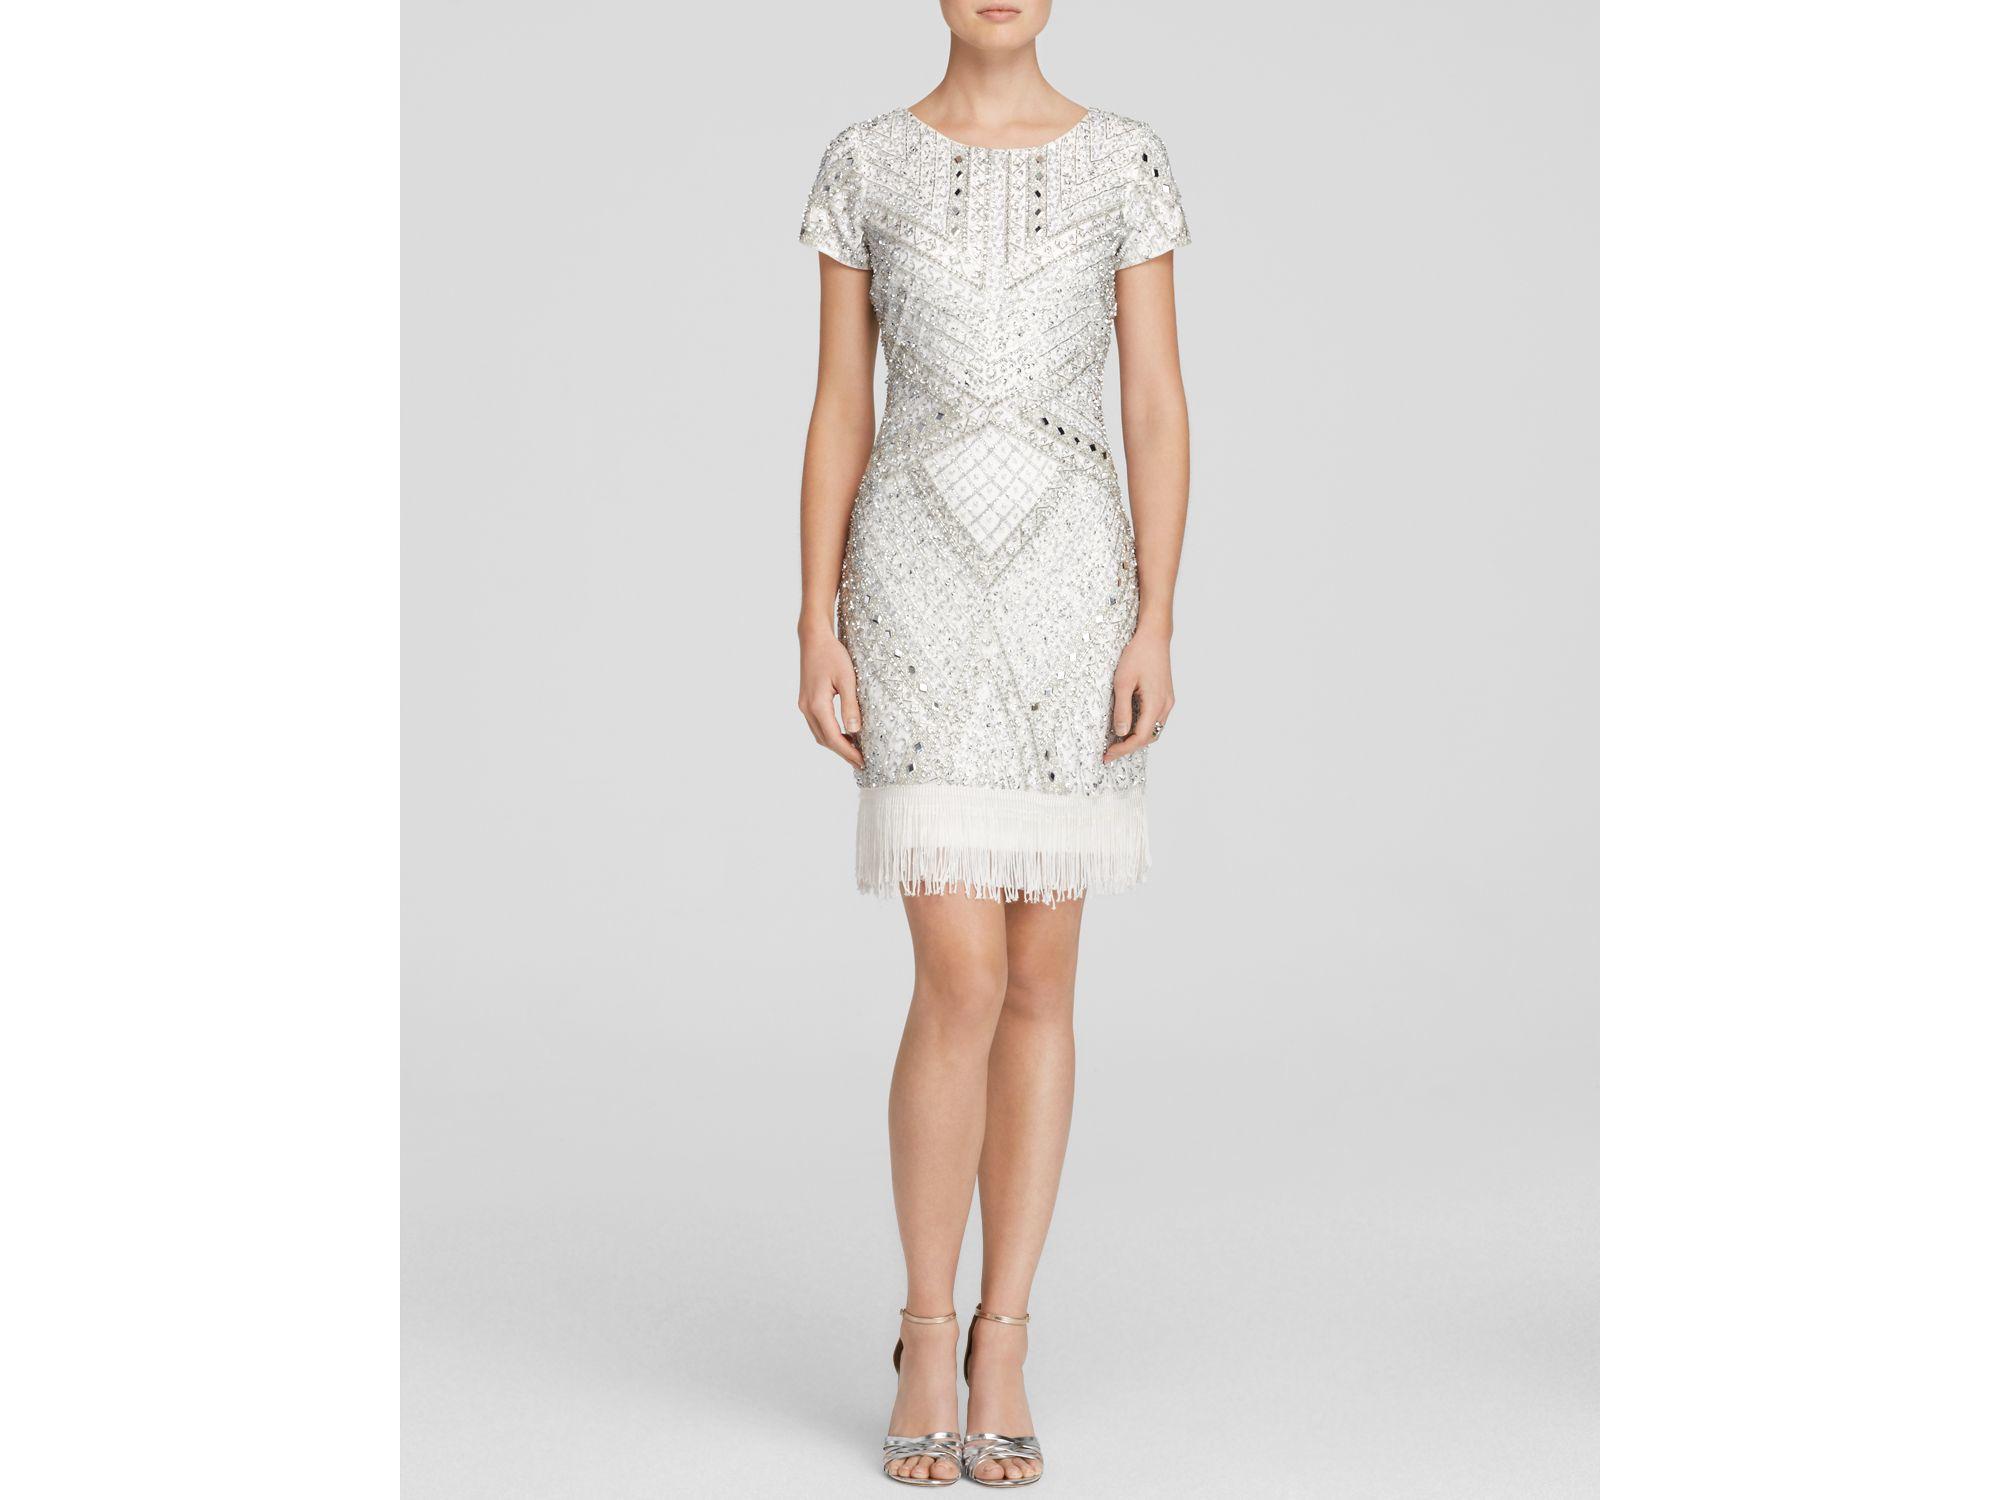 Beaded Fringe Dress with Sleeves